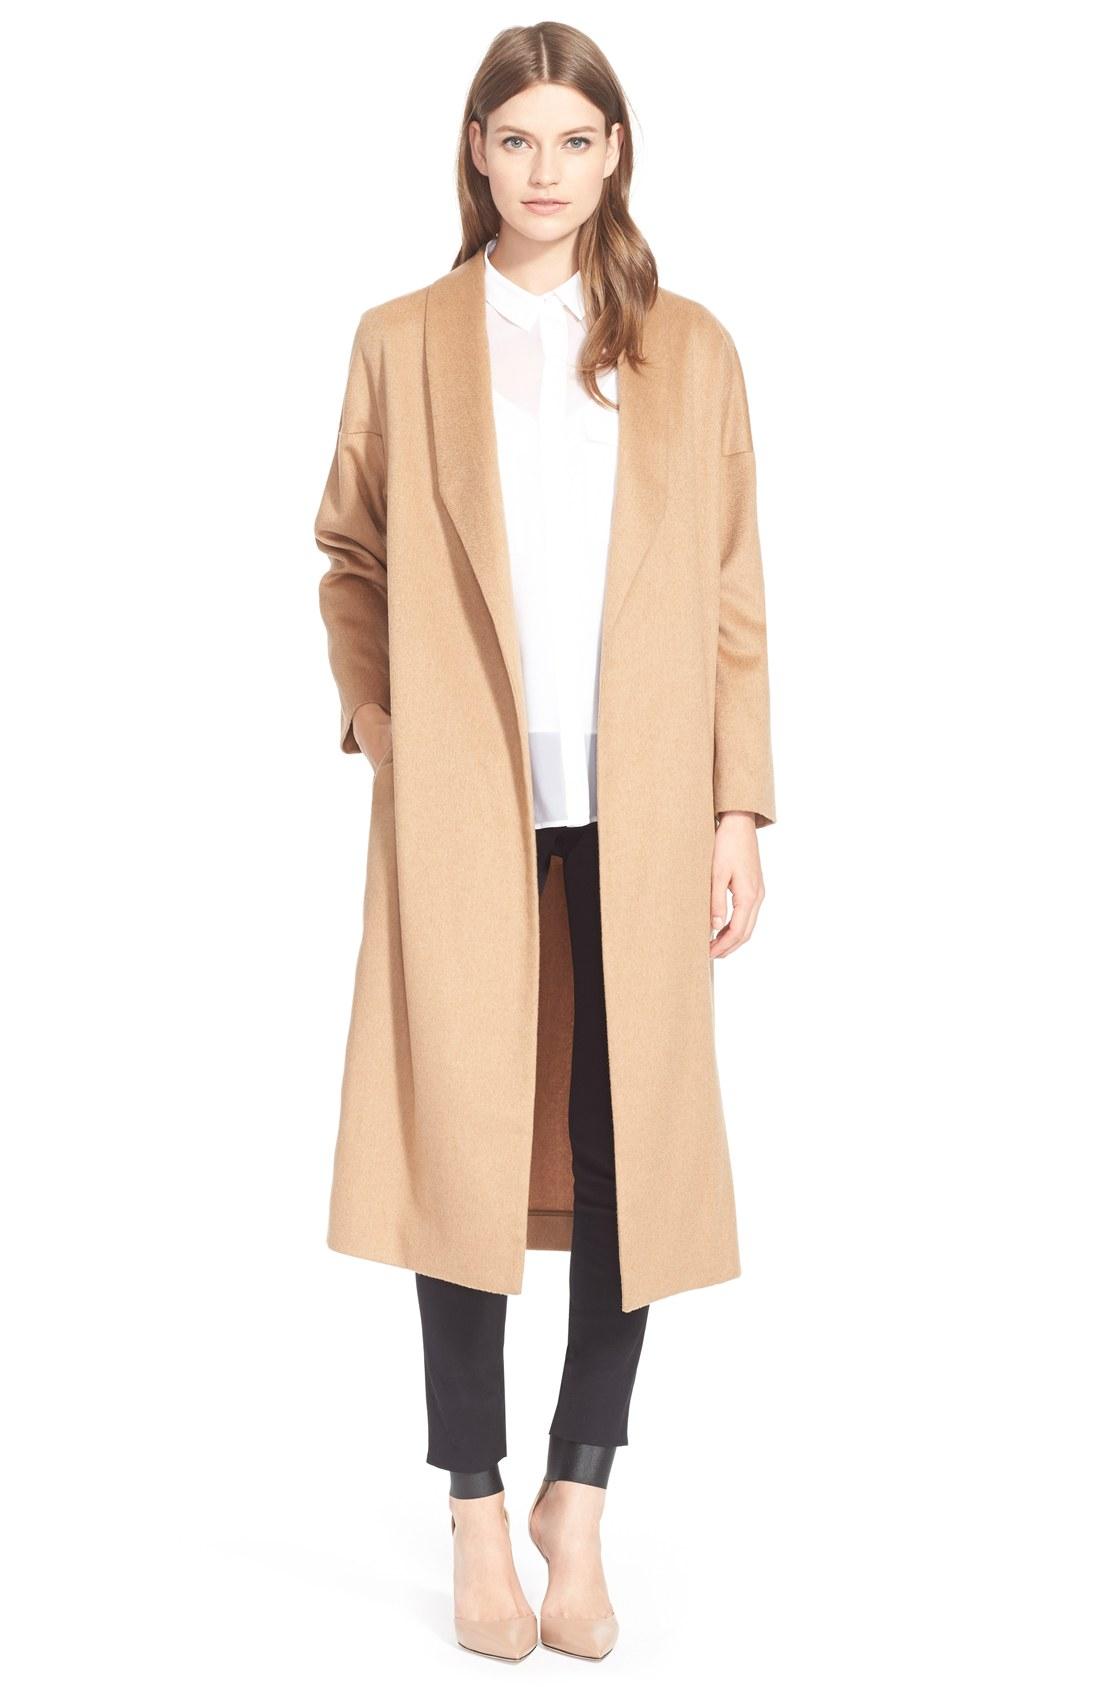 AYR 'The Robe' Camel Hair Maxi Coat